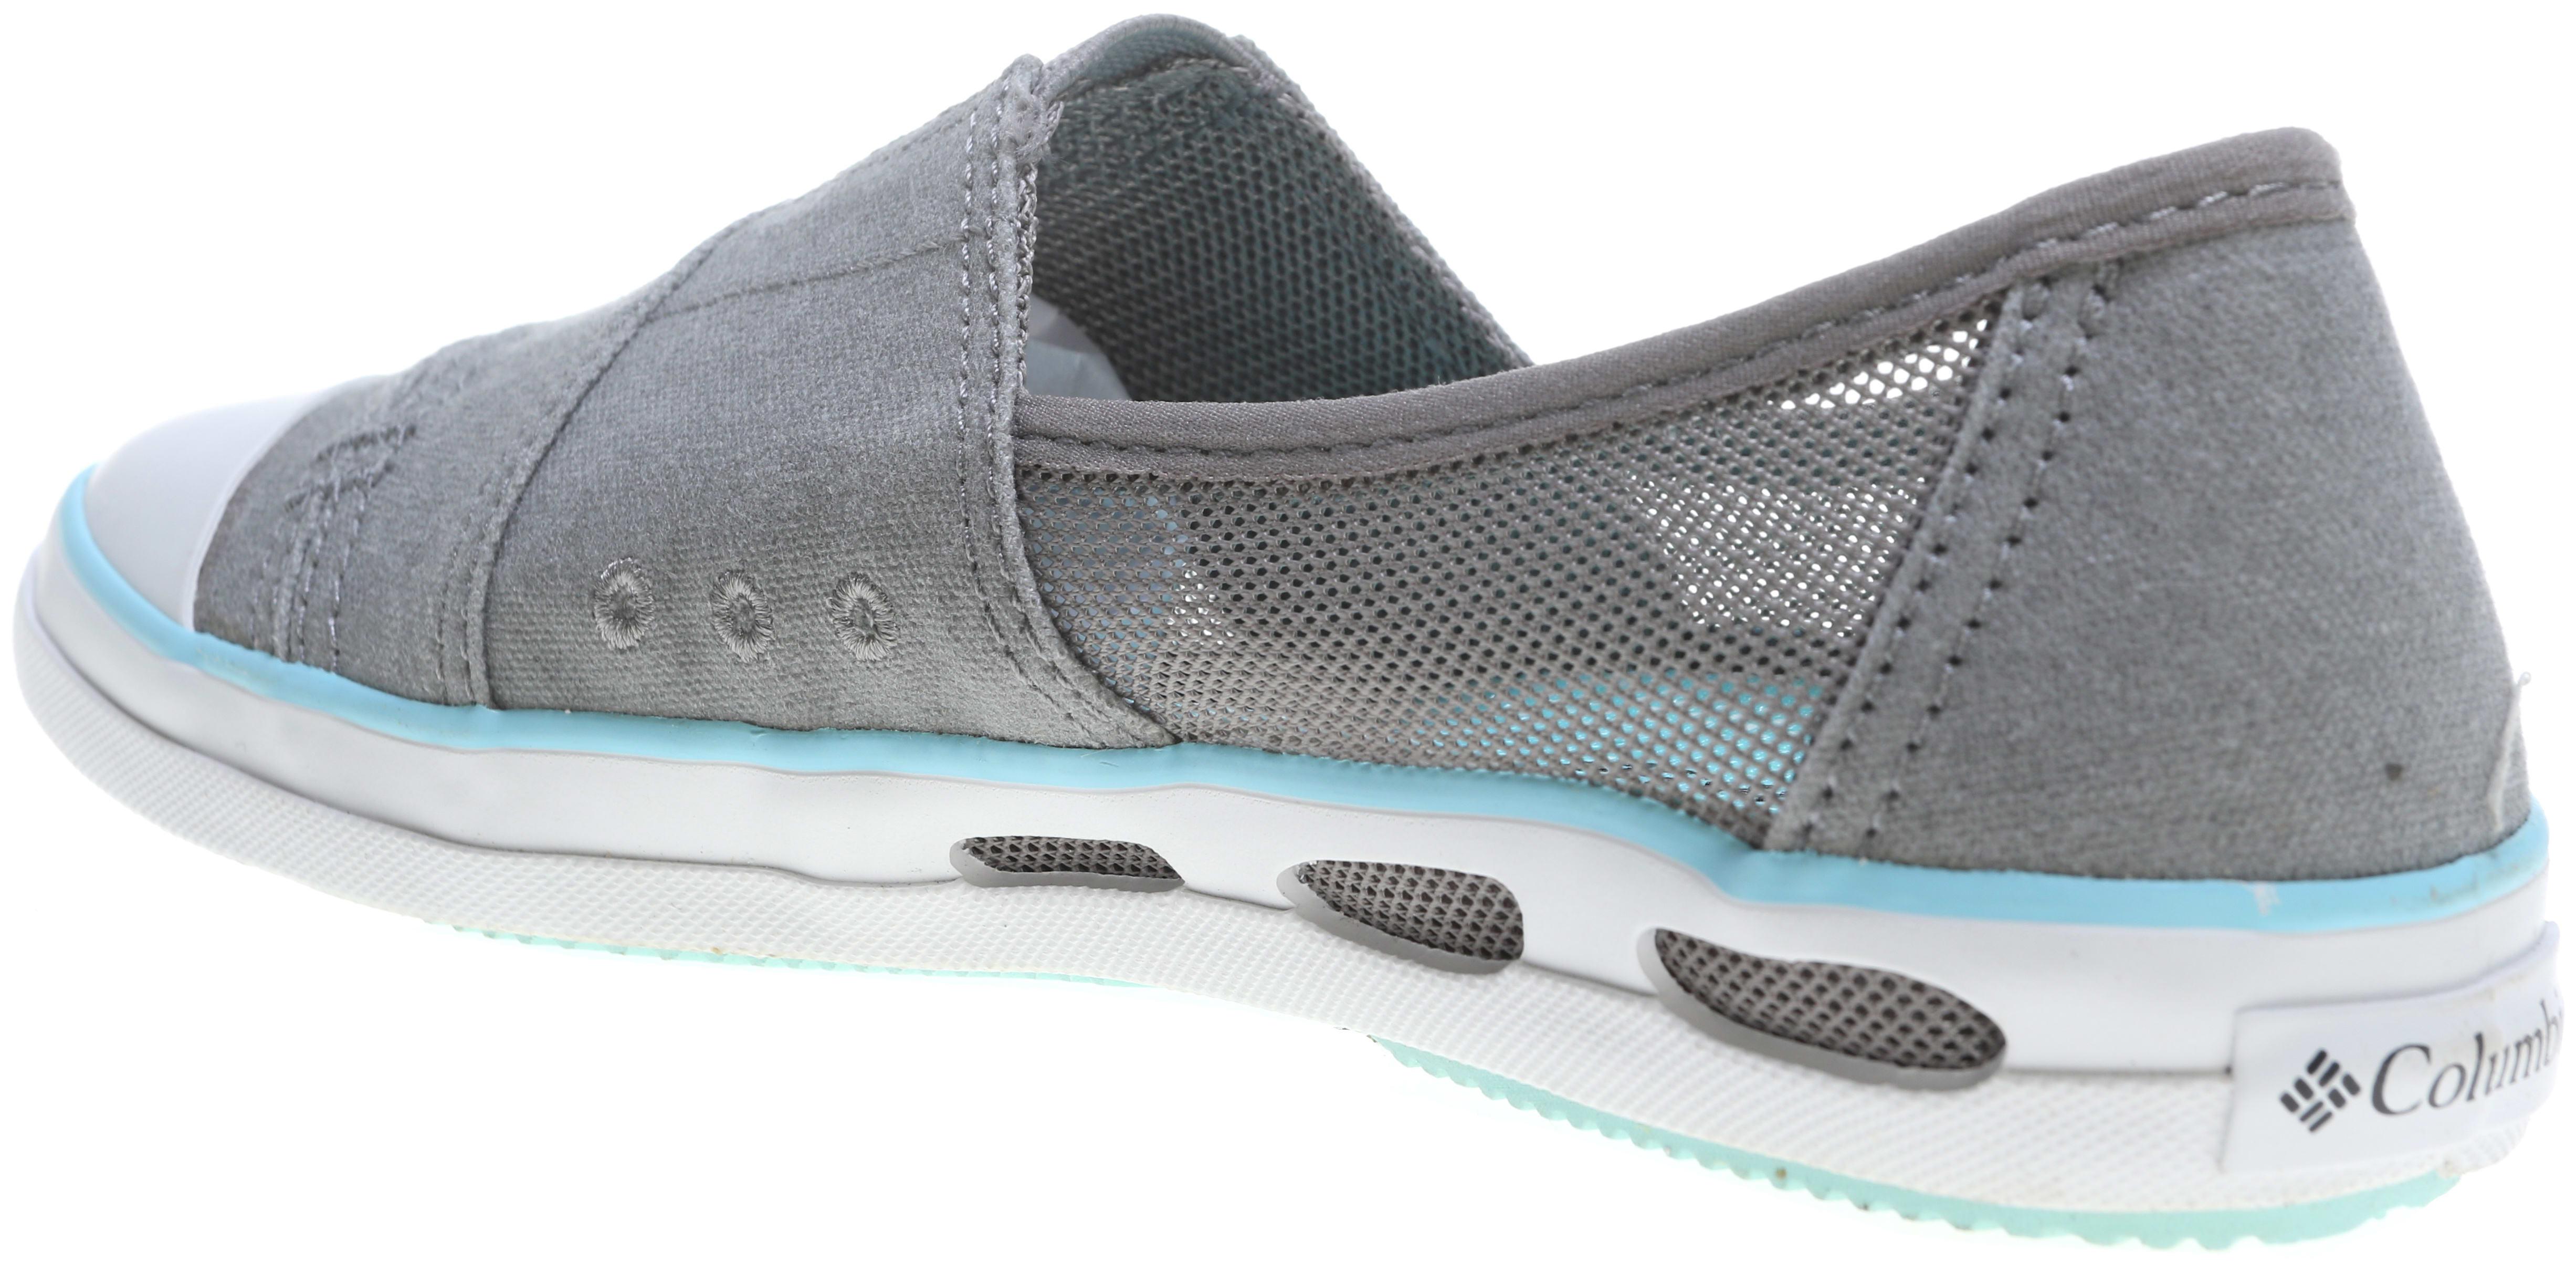 4317fe3482 Columbia Vulc N Vent Slip Shoes - thumbnail 3